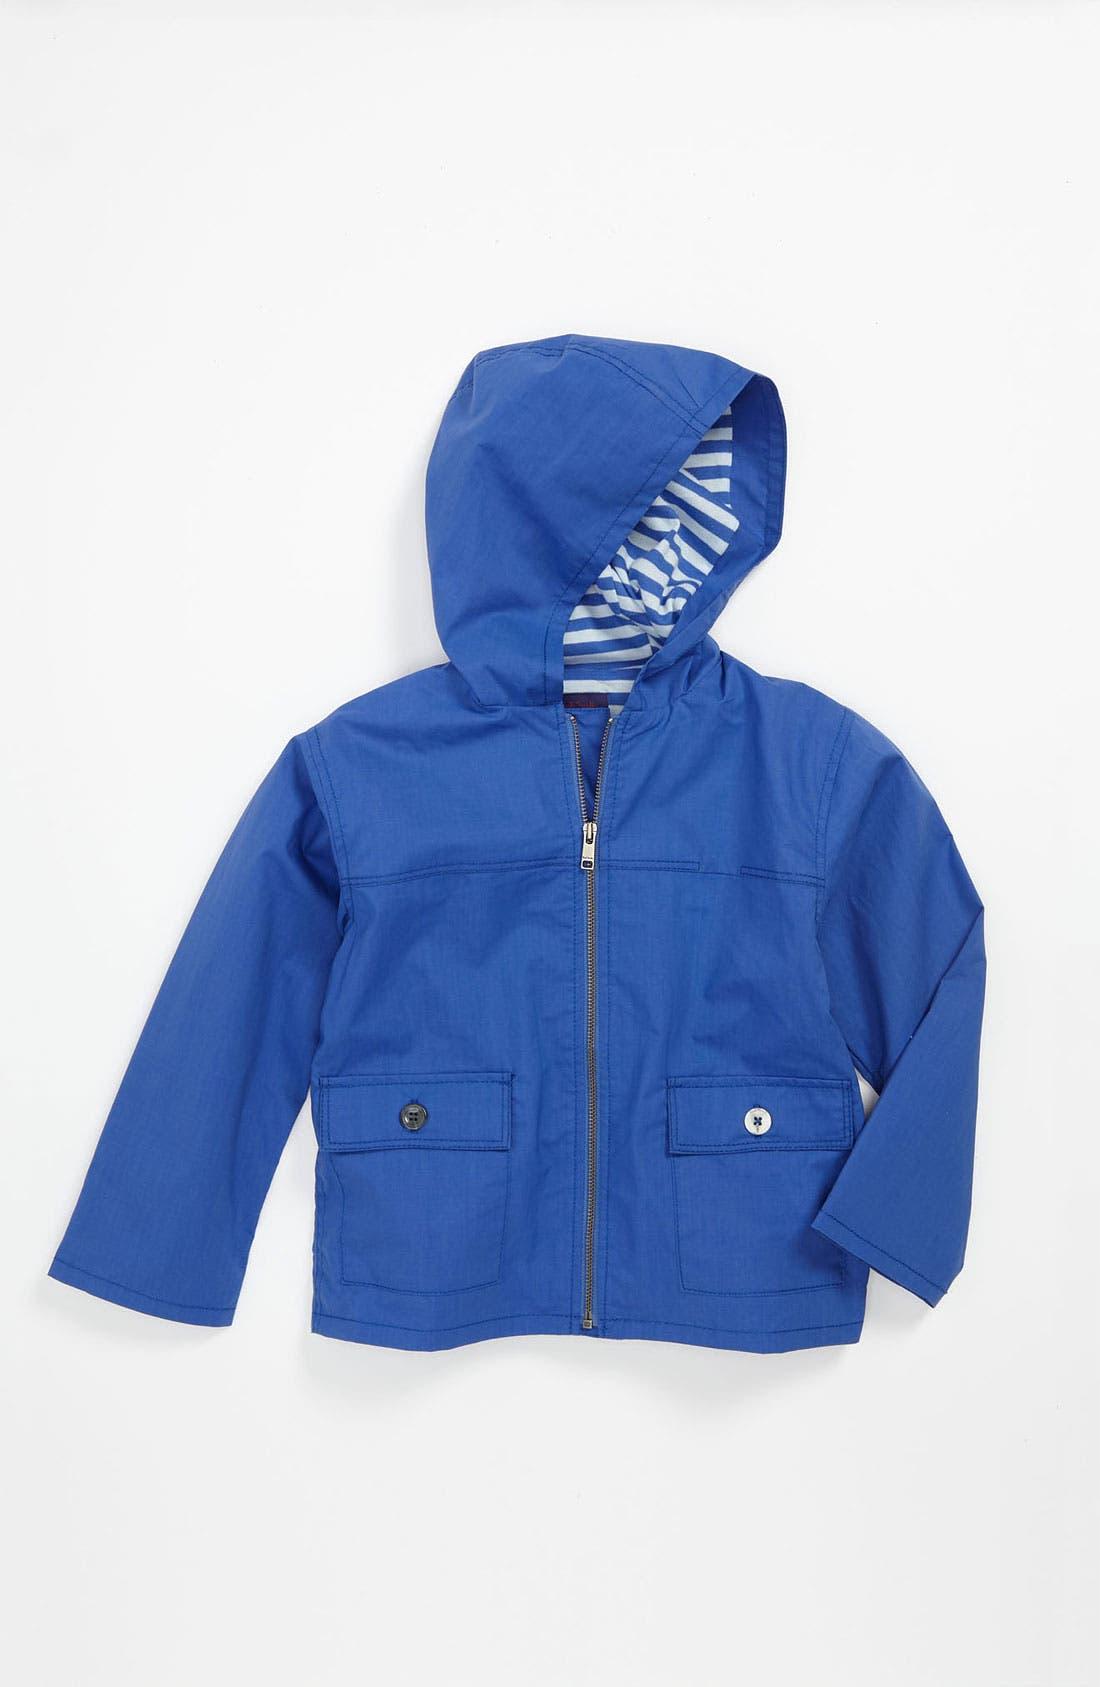 Alternate Image 1 Selected - Paul Smith Junior Jacket (Toddler)